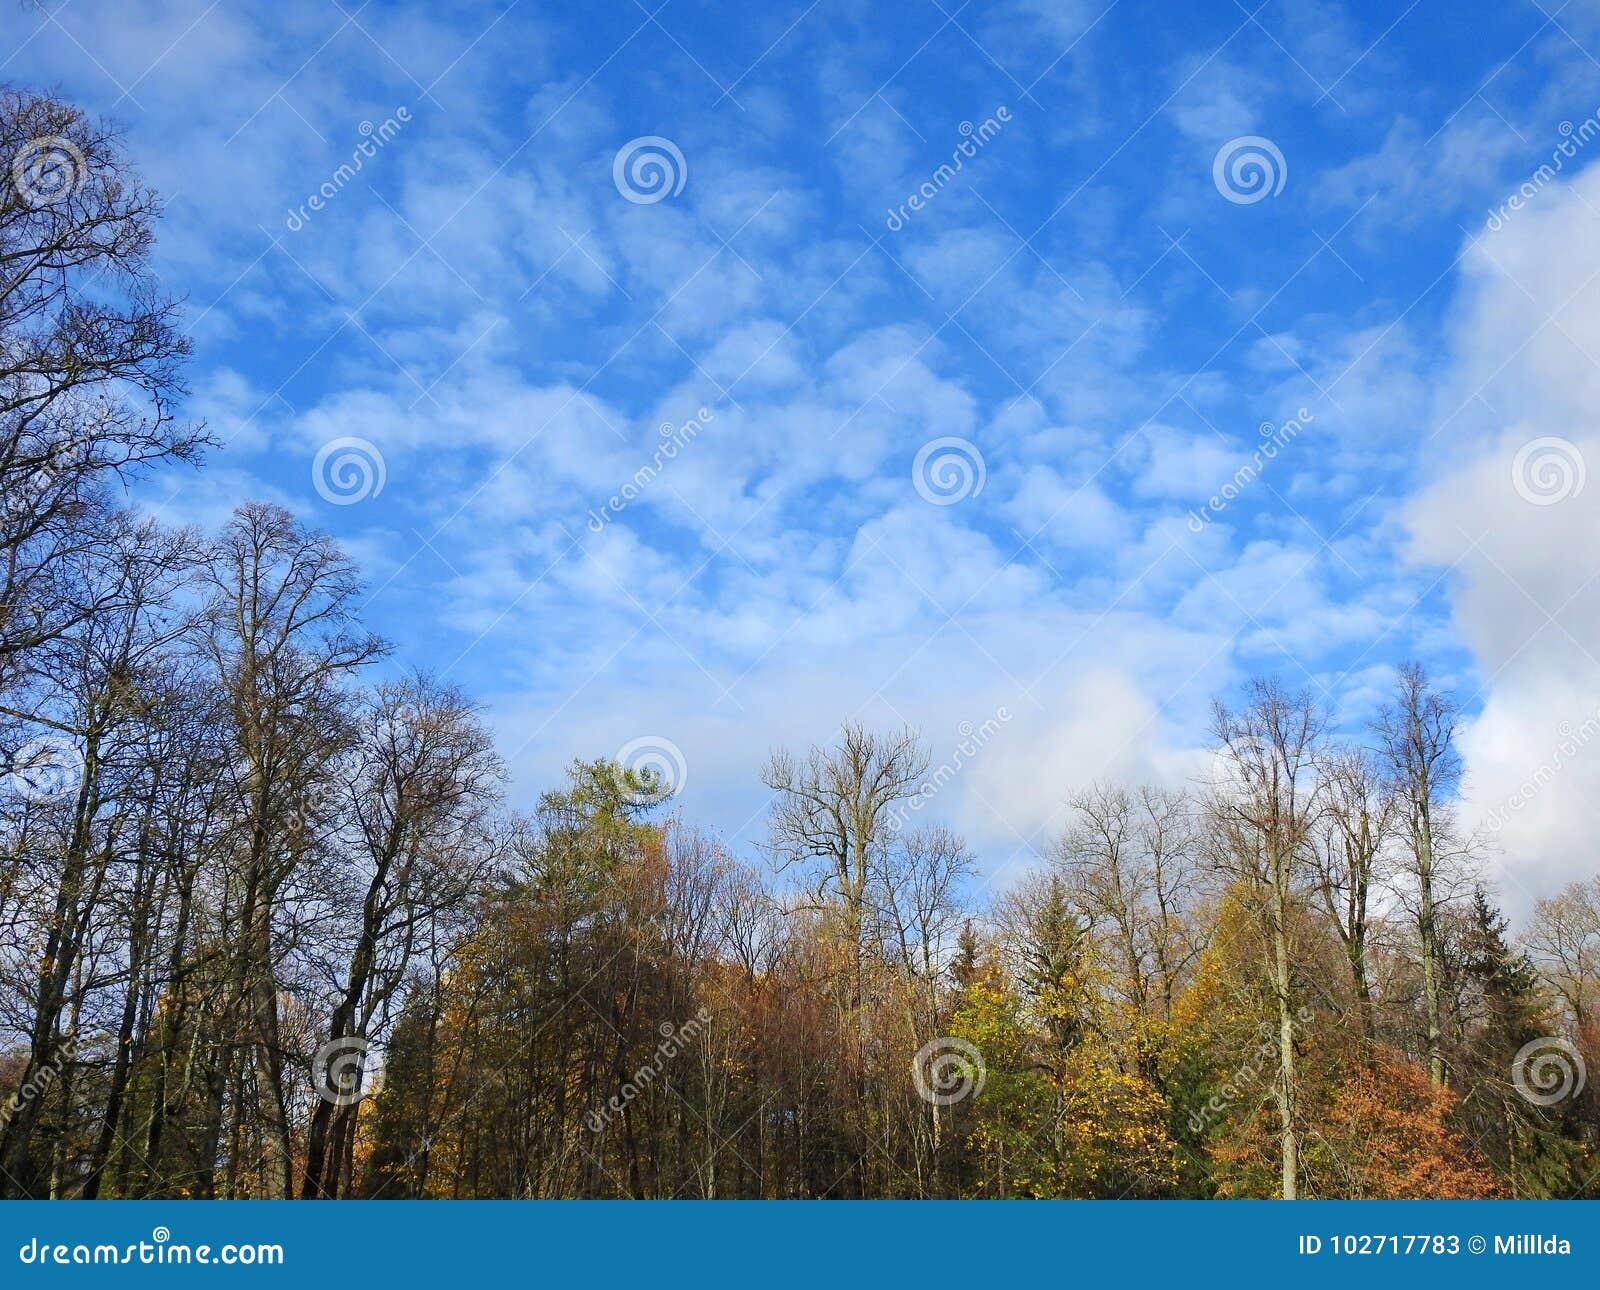 Colorful autumn trees and beautiful sky, Lithuania